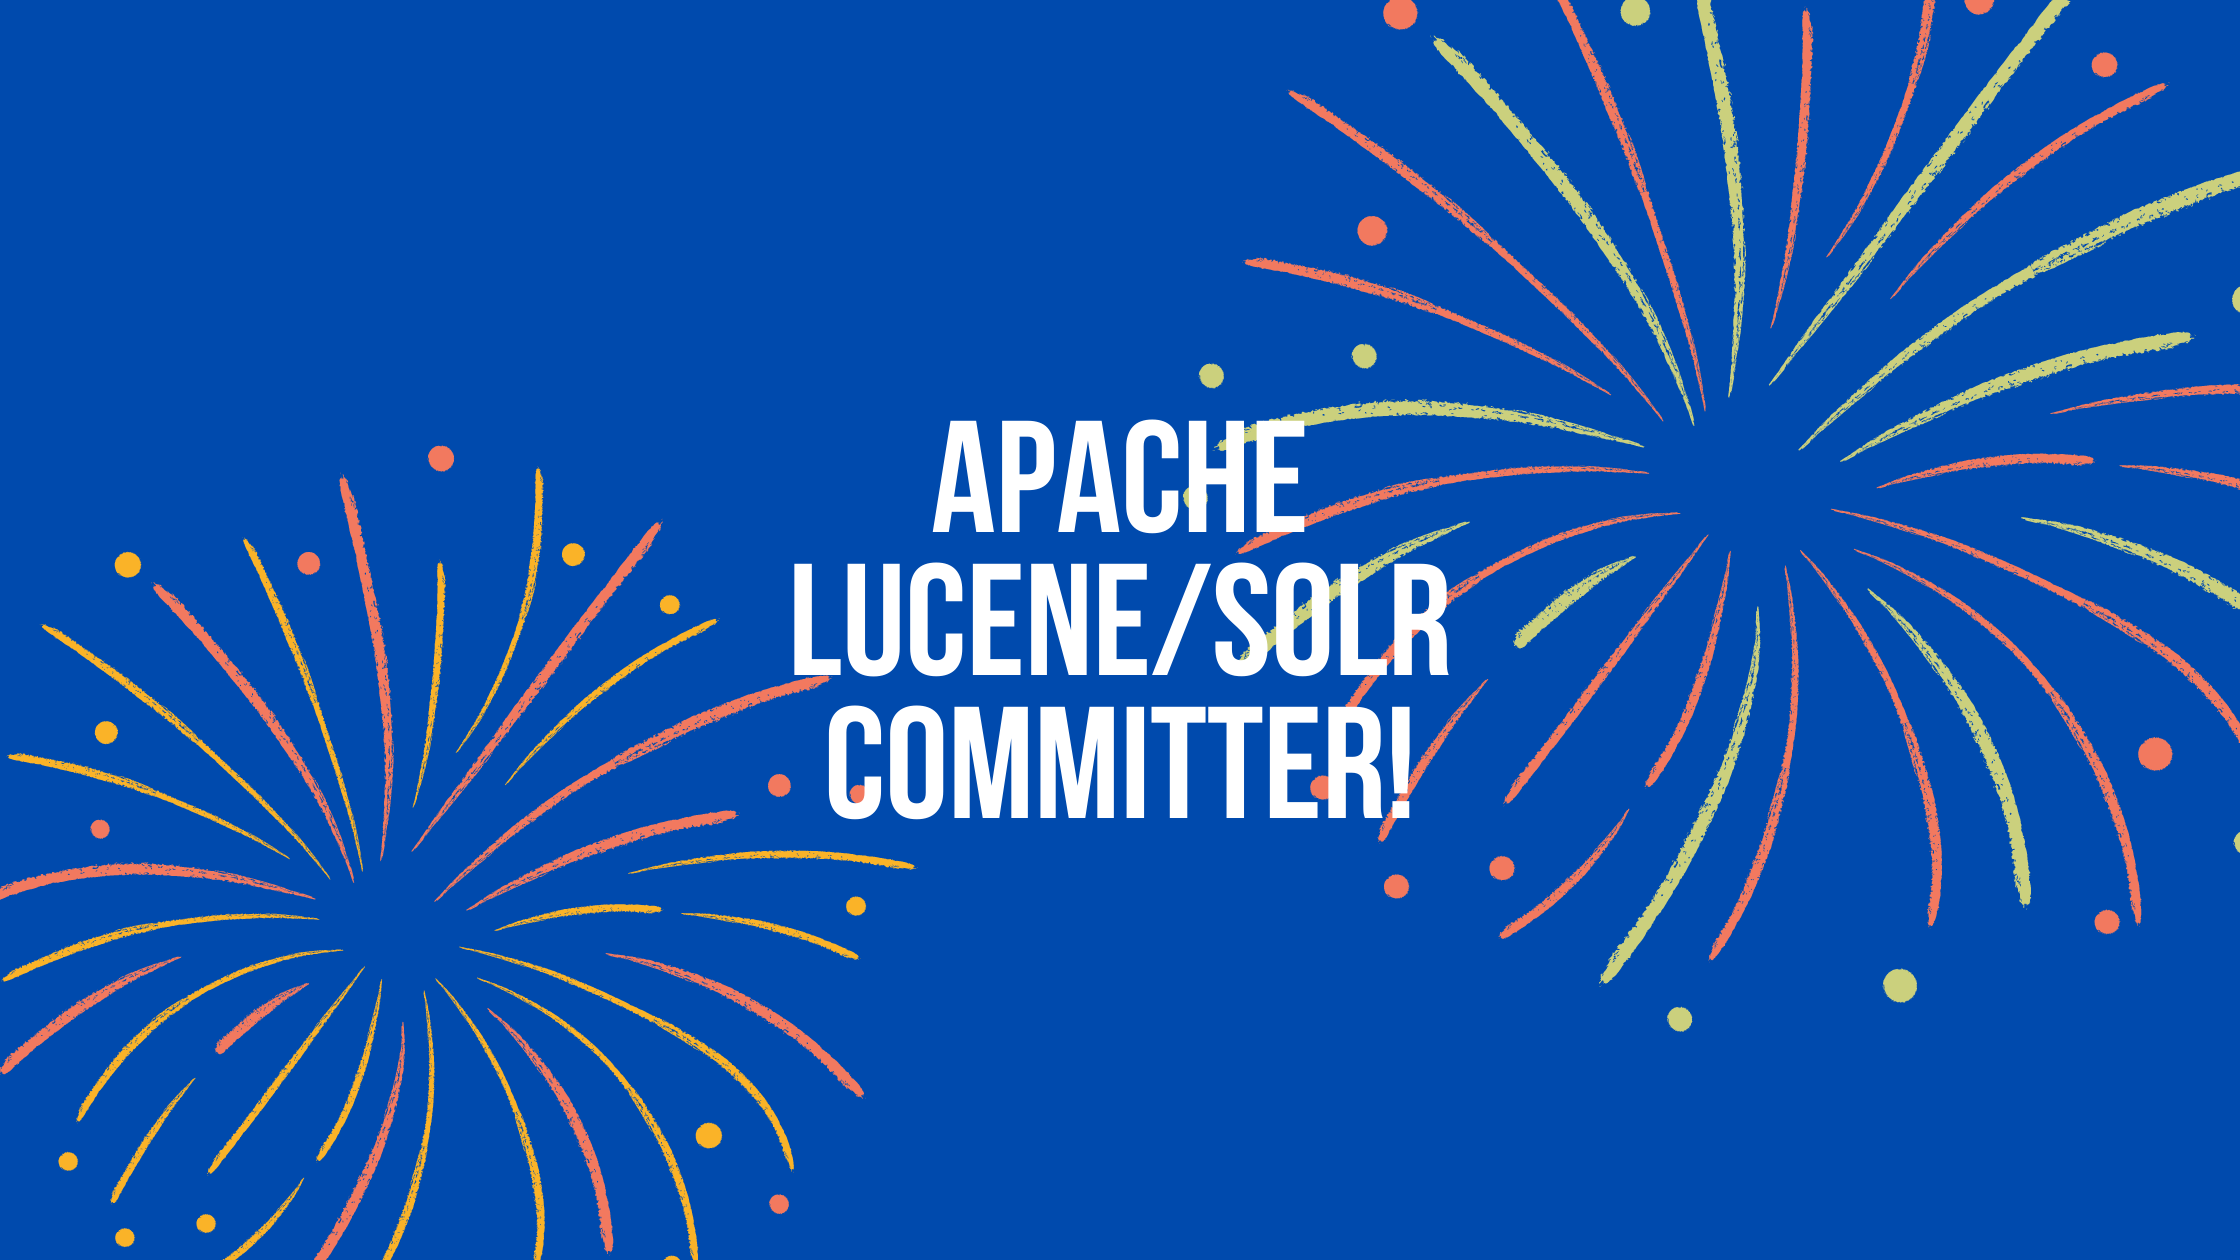 apache lucene solr committer italy